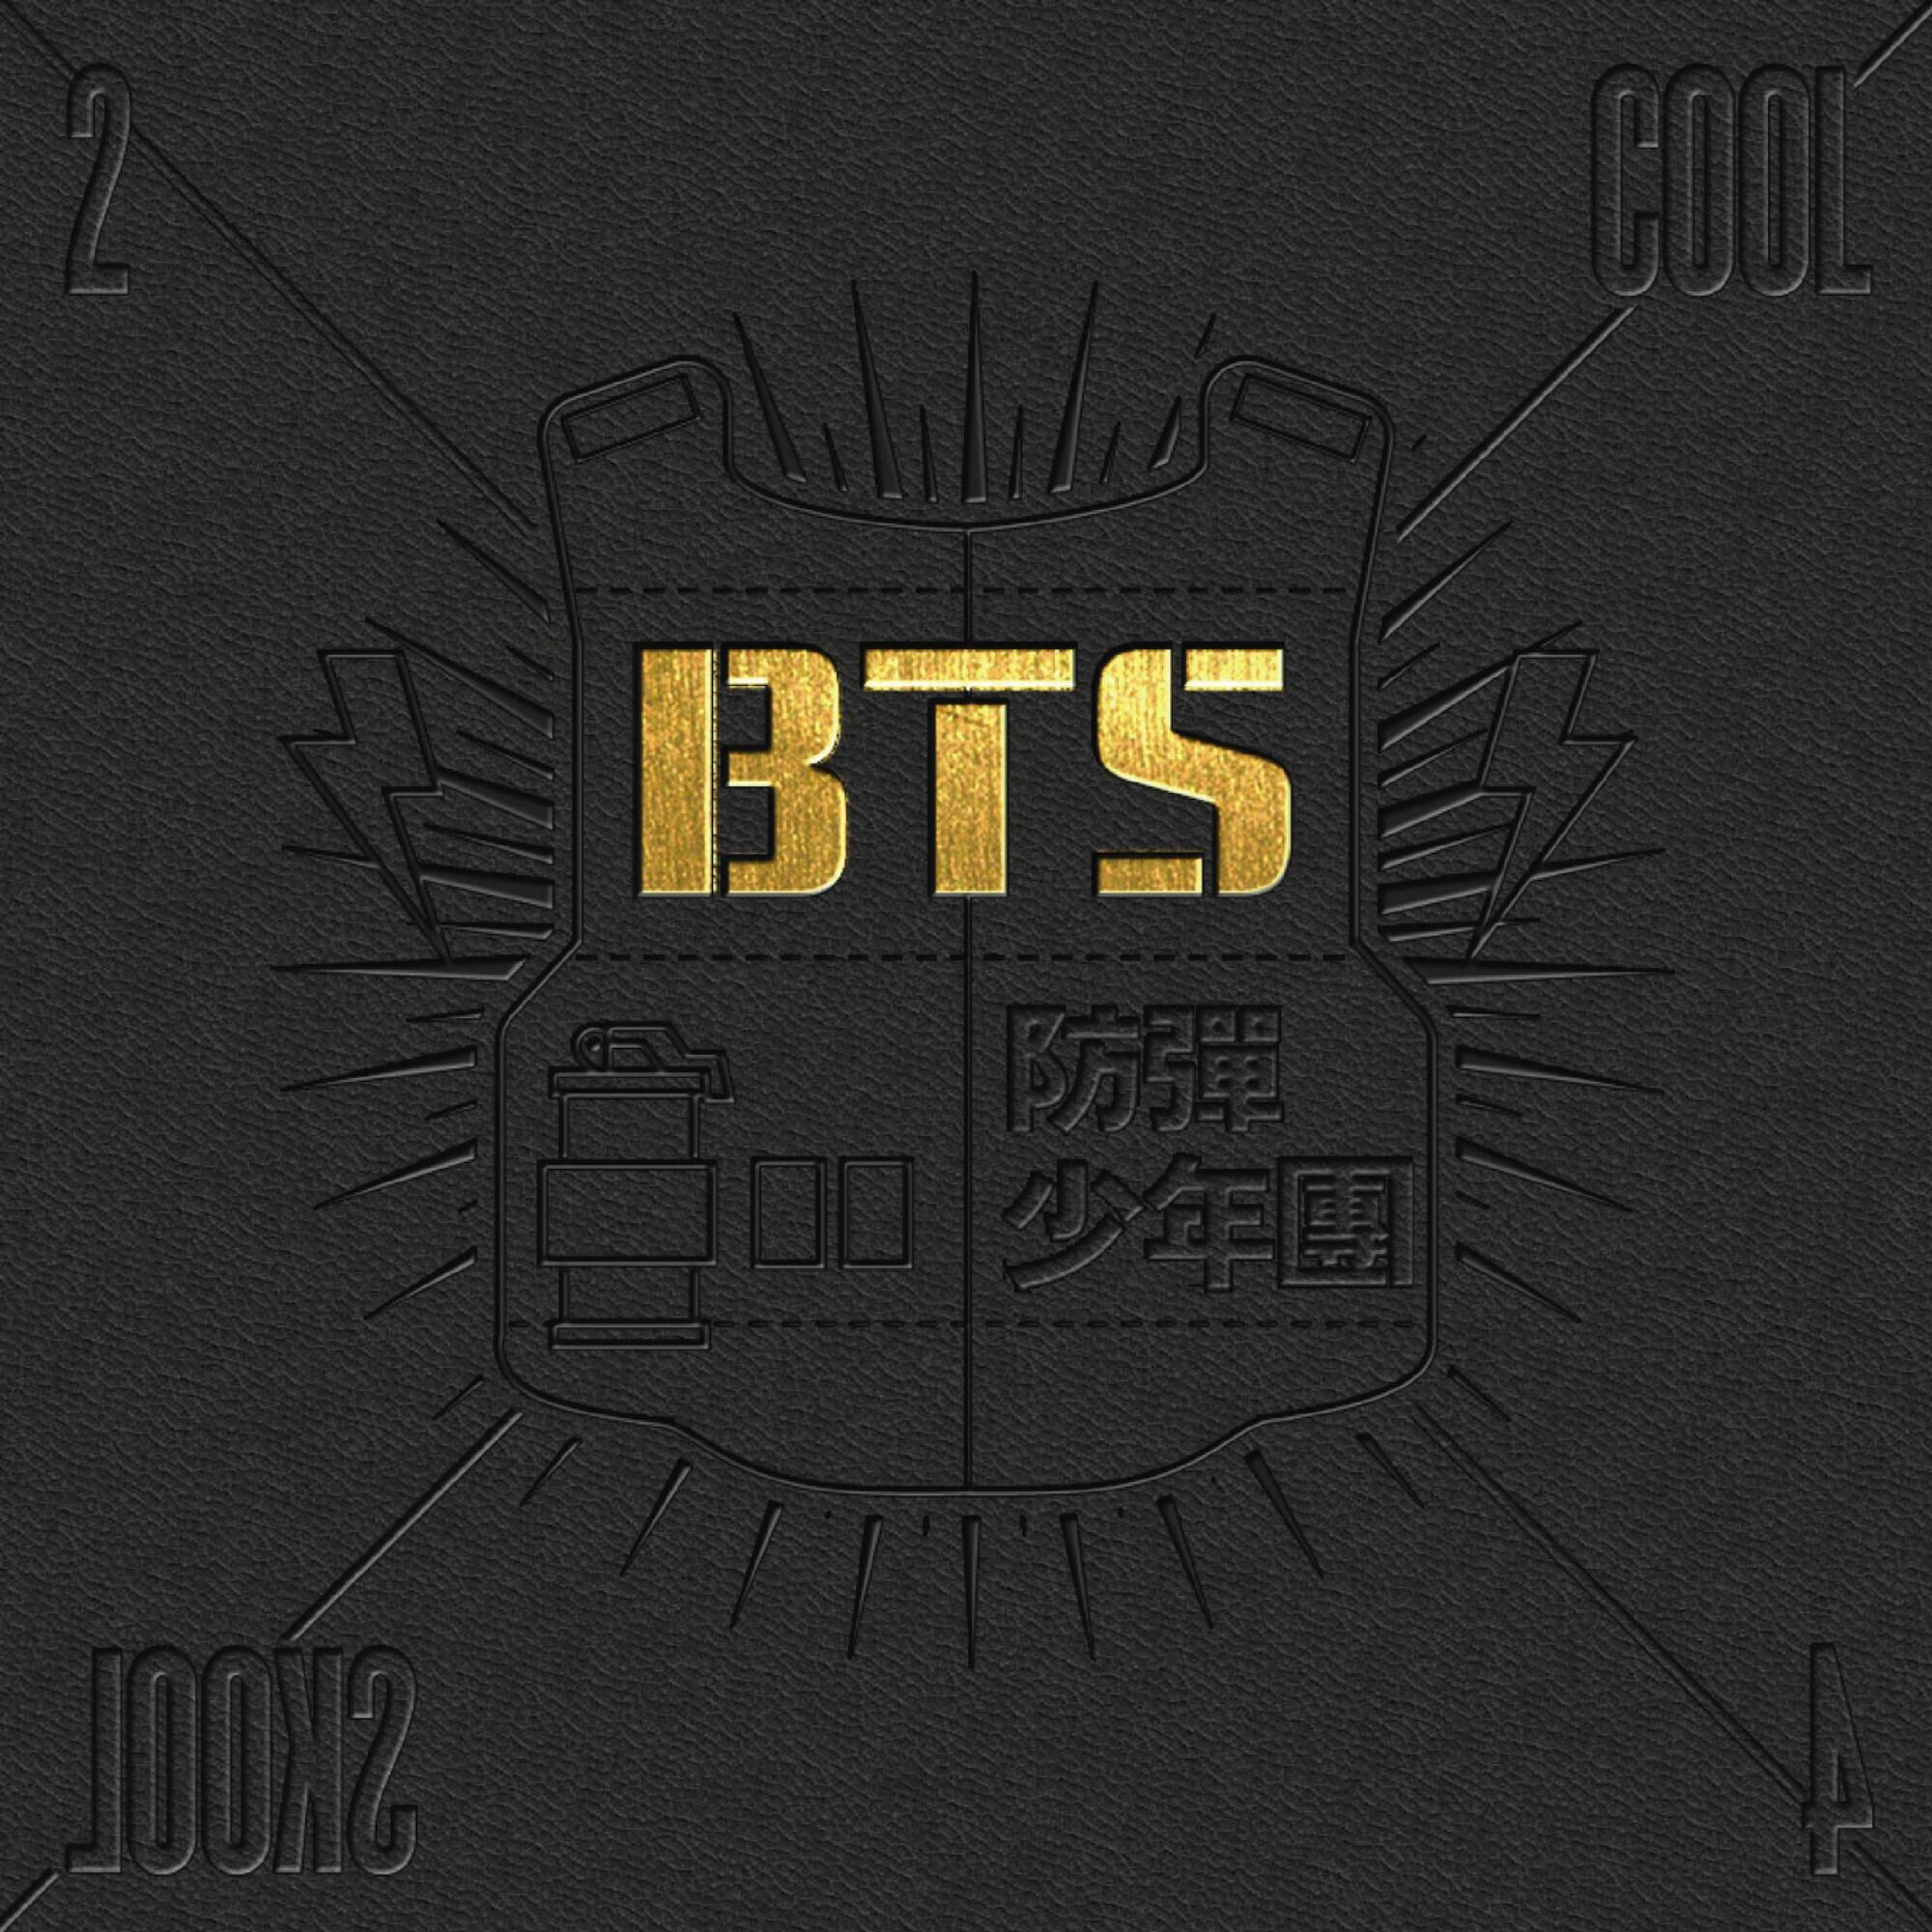 Bts Albums Songs Bts Profile